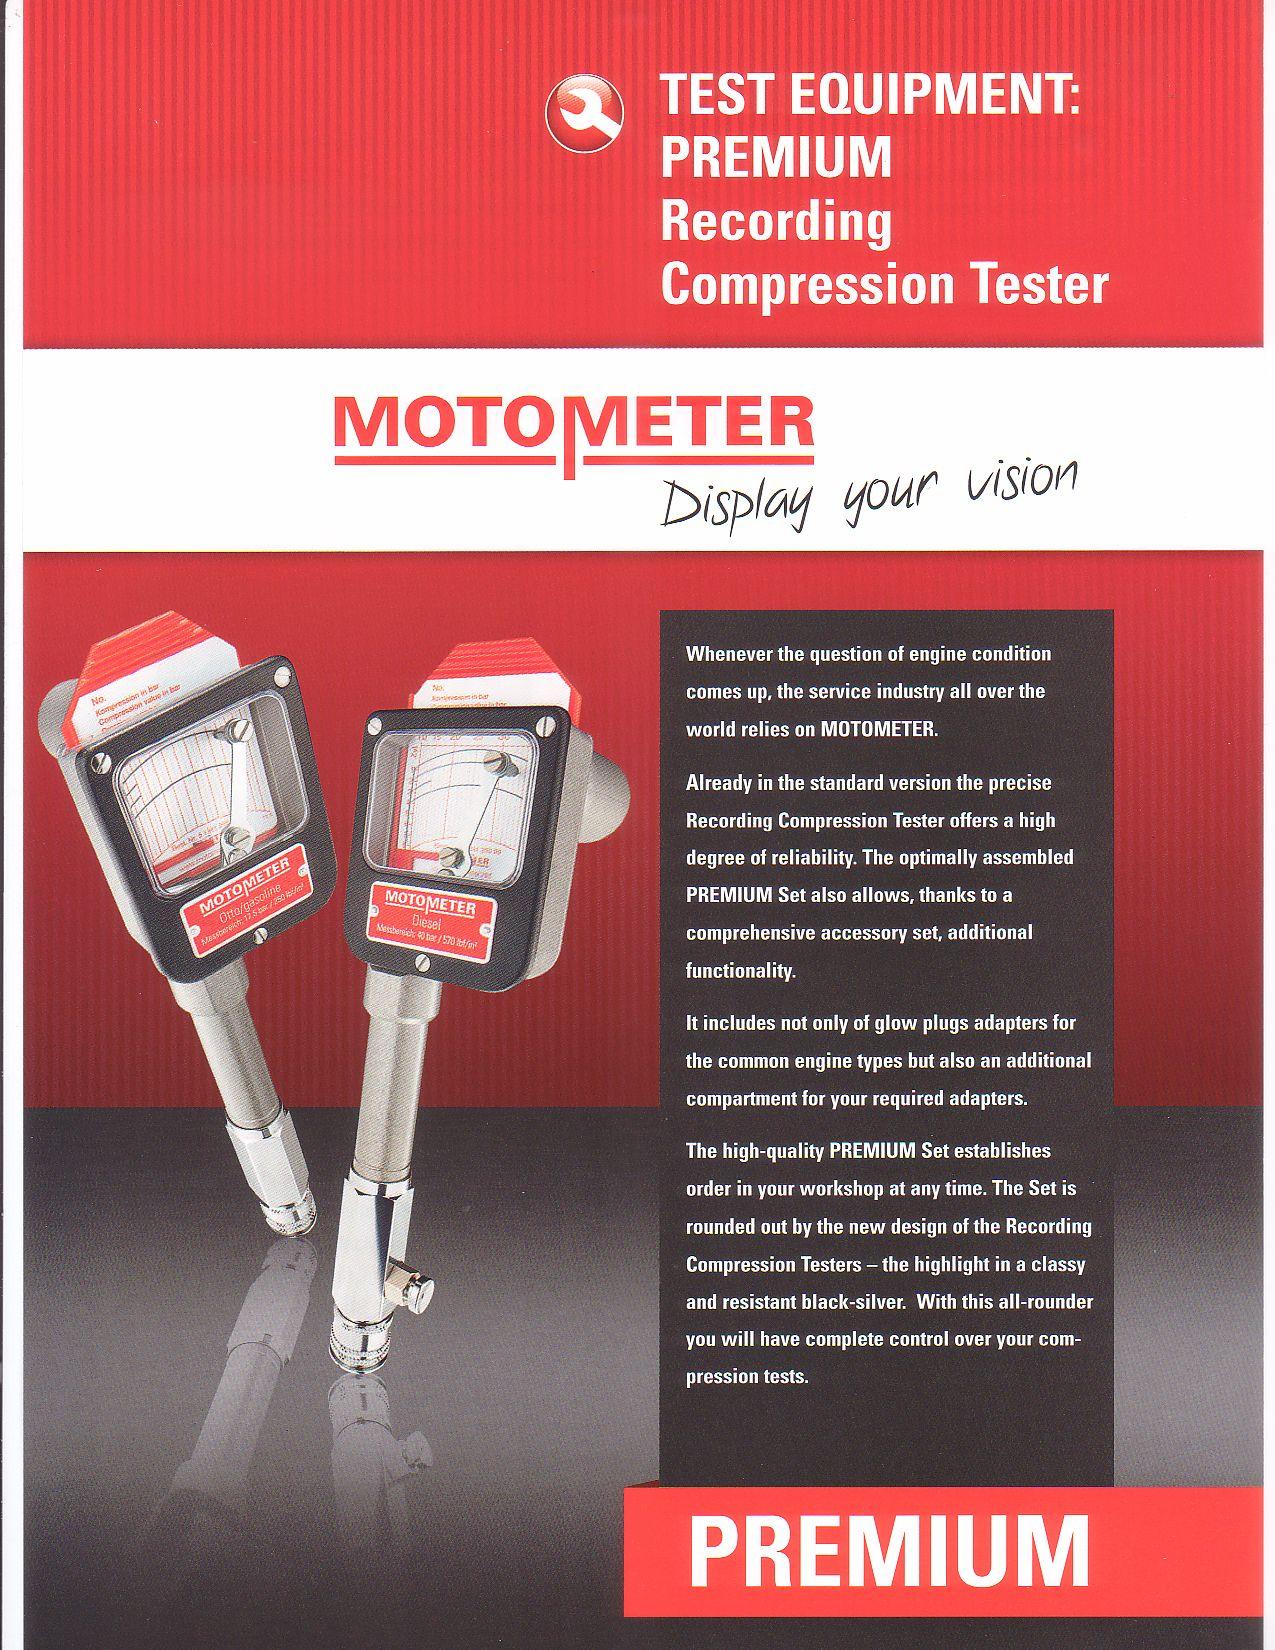 hight resolution of motometer premium compression tester sets